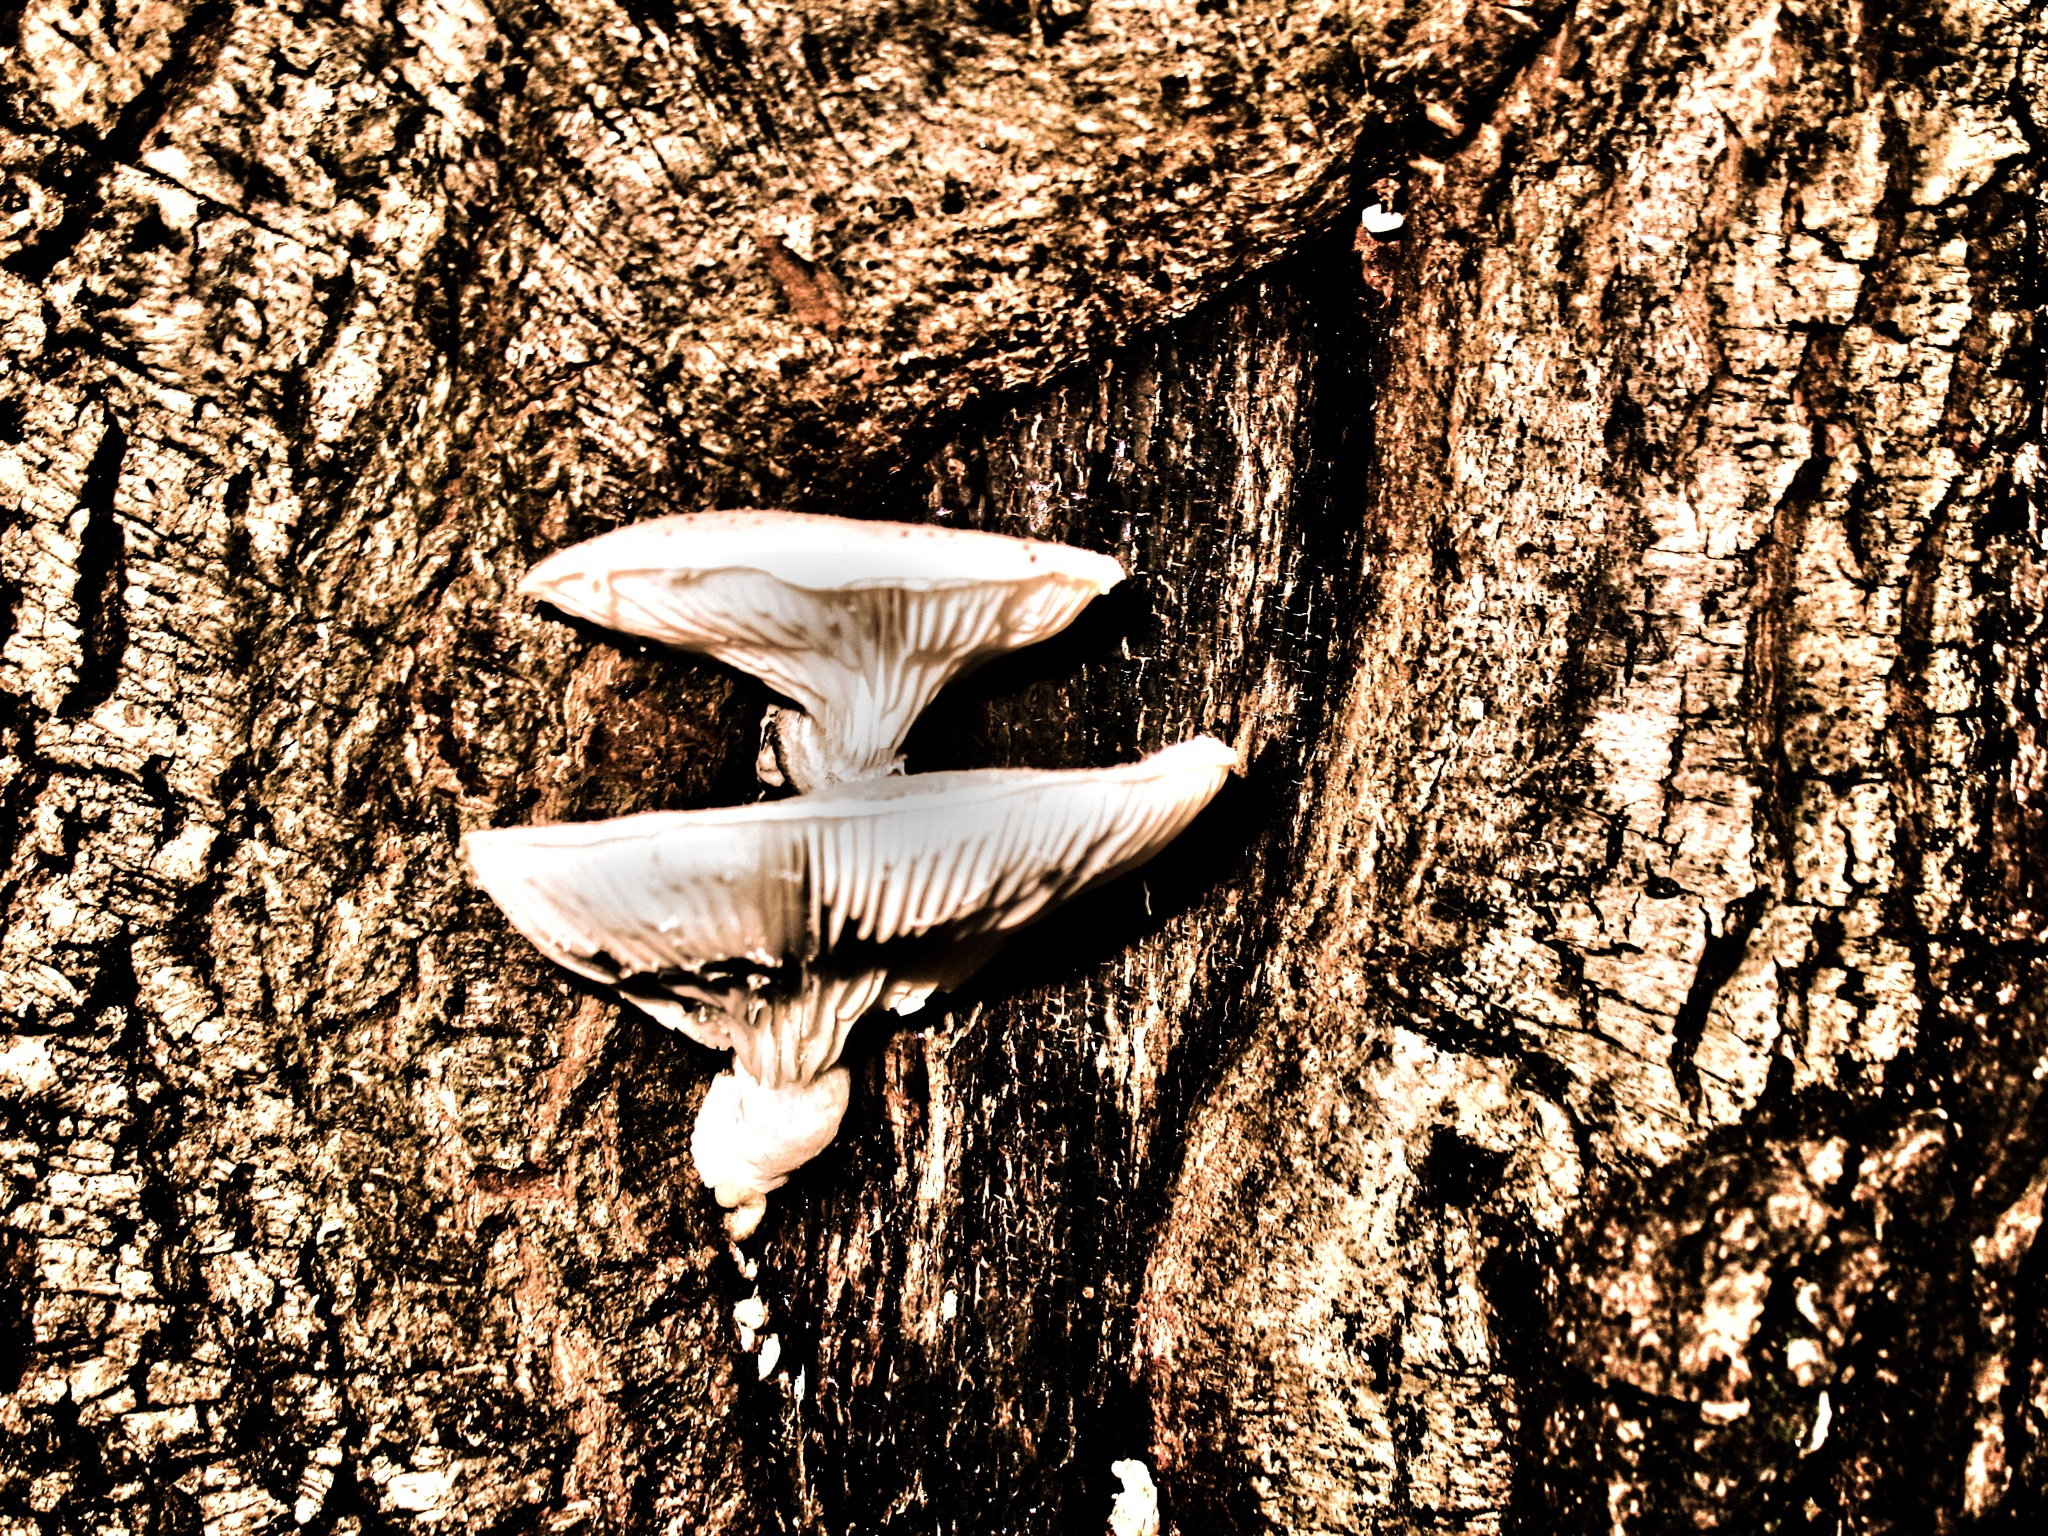 mushrooms from trunk by Cesare Vatrano